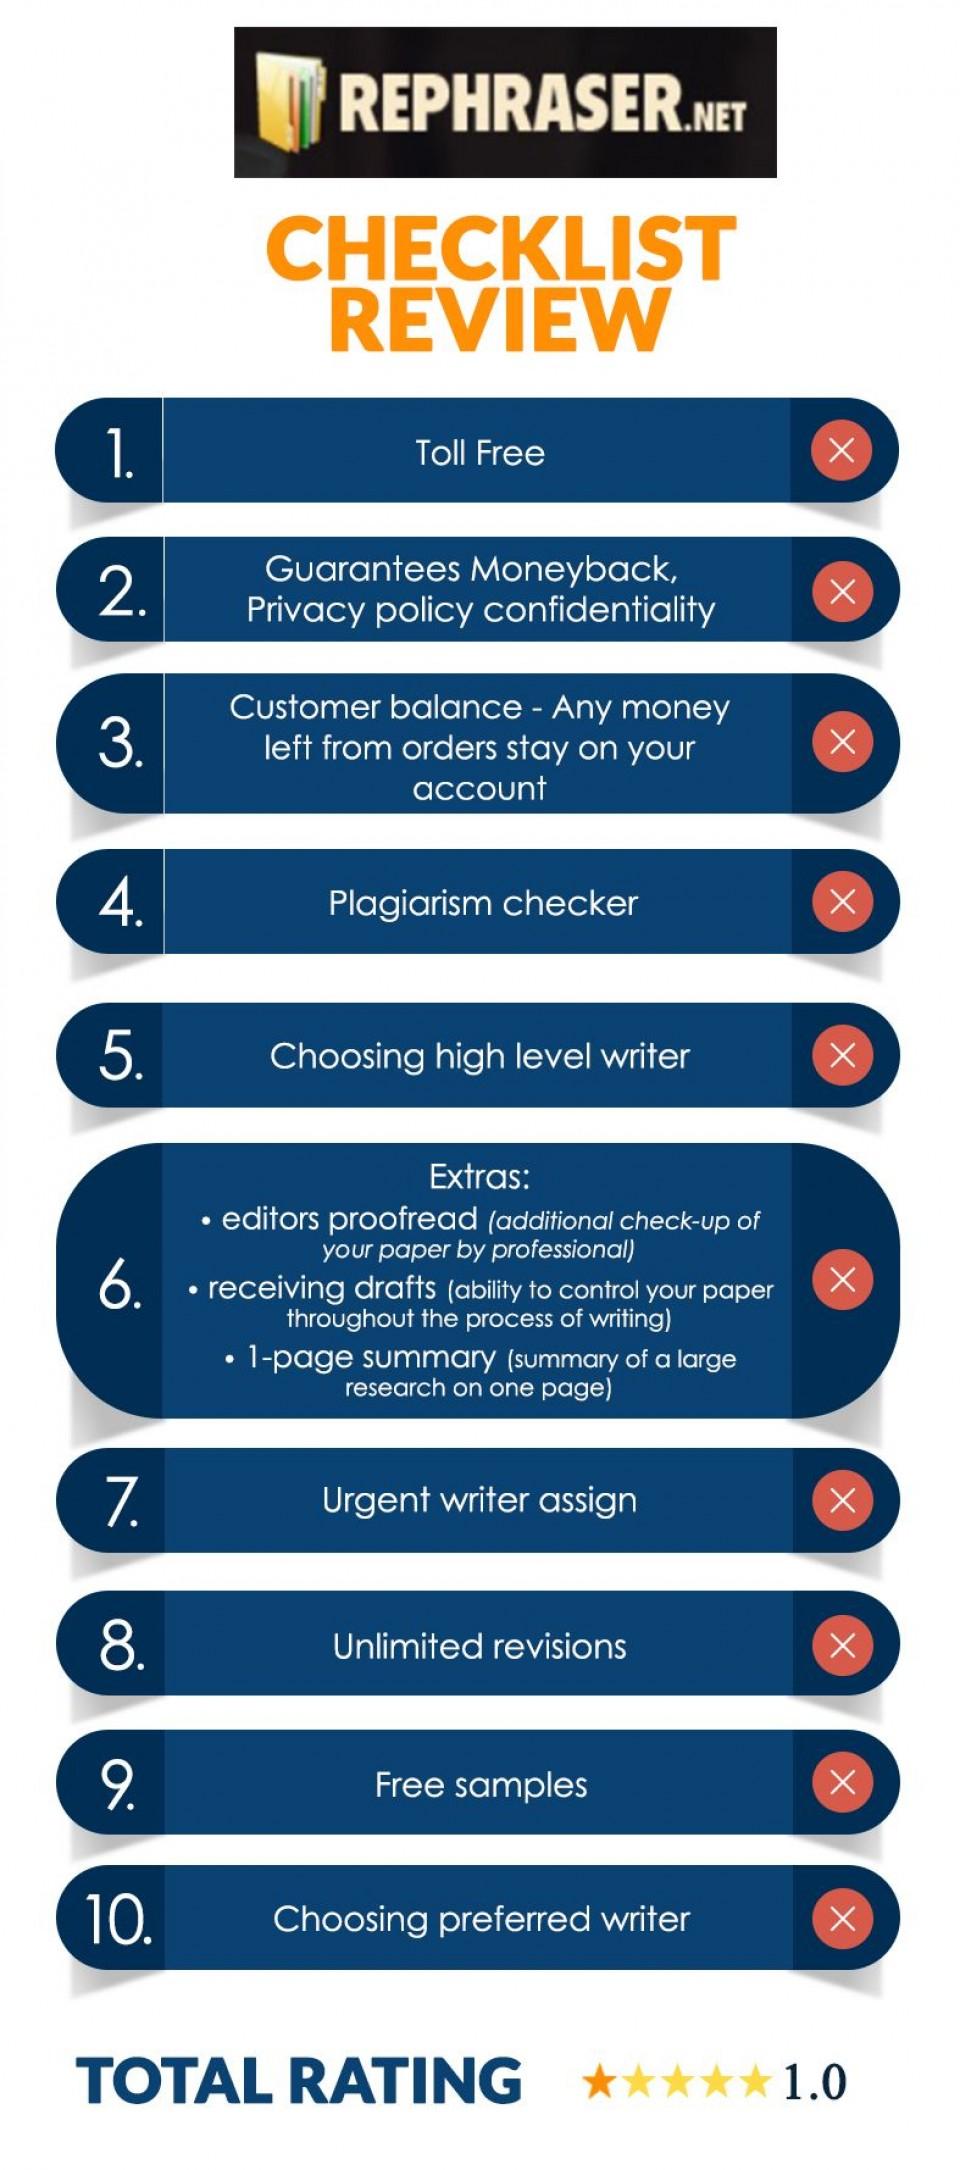 009 Essay Checker Free Online Amazing Sentence Grammar Plagiarism Document 960